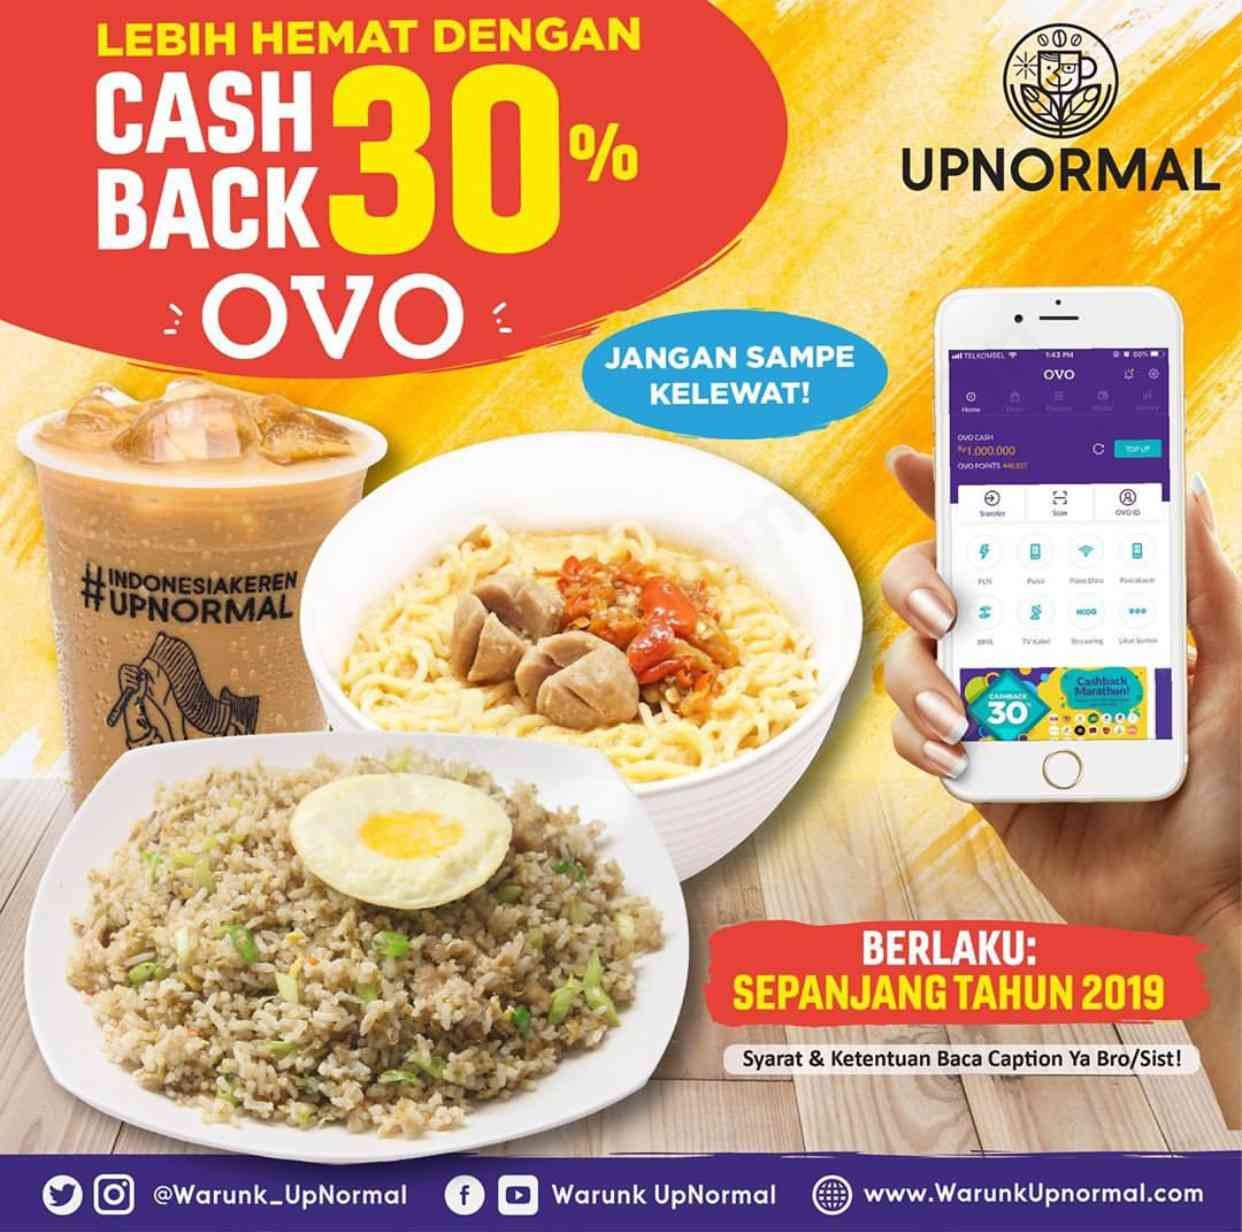 Warunk Upnormal Cashback 30% dengan OVO